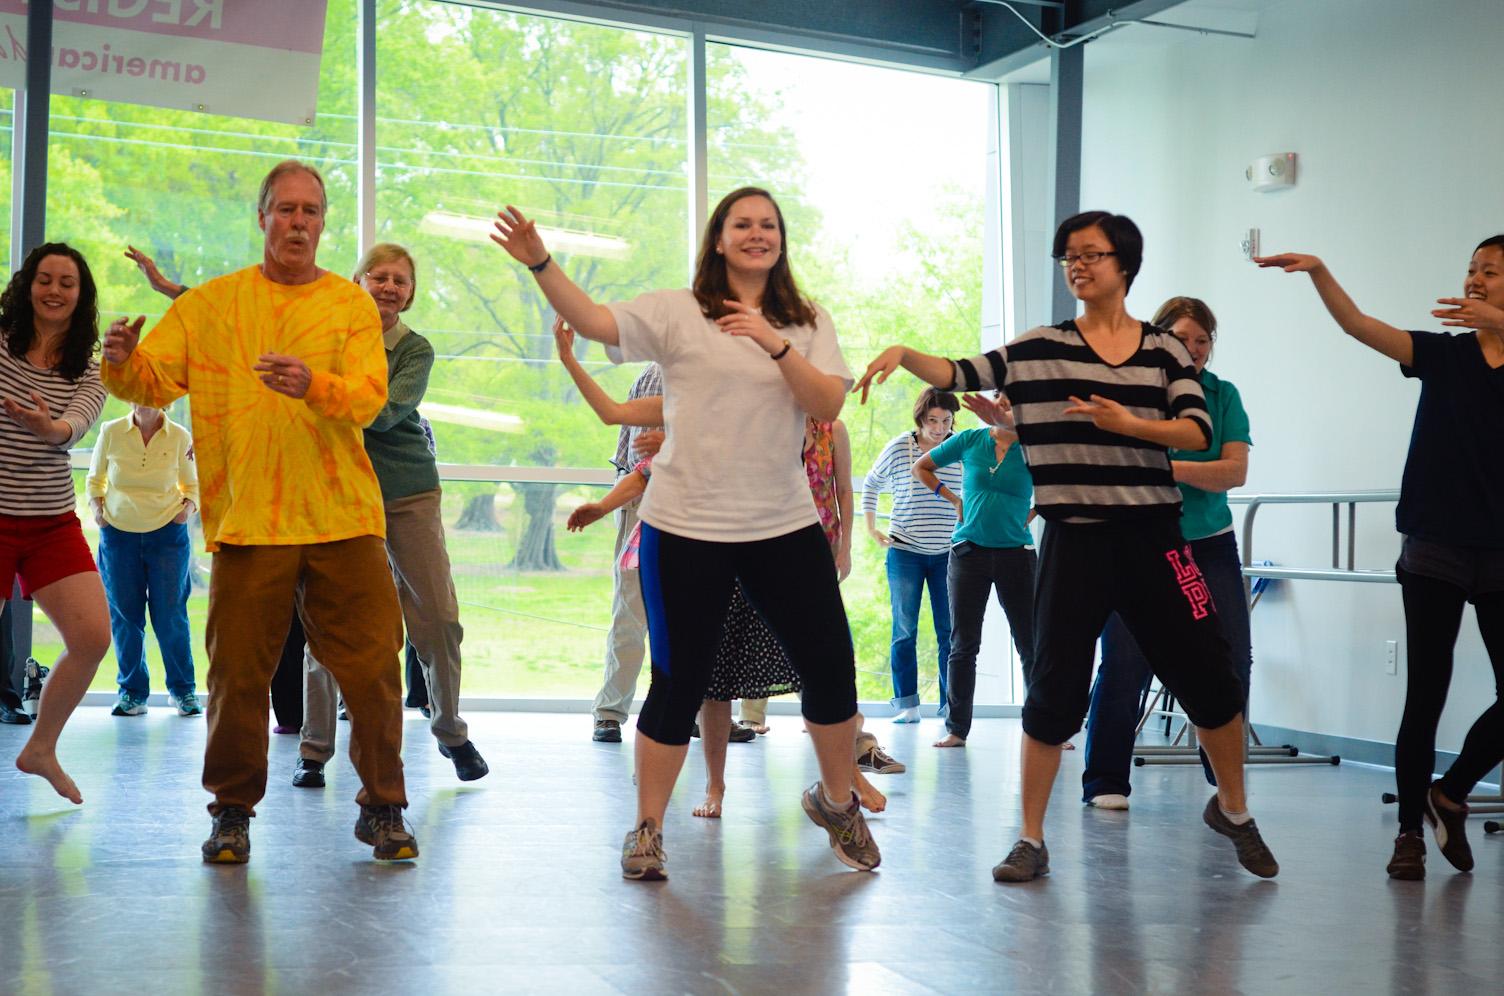 ADF, Dance for Parkinson's, Parkinson's Movement Initiative